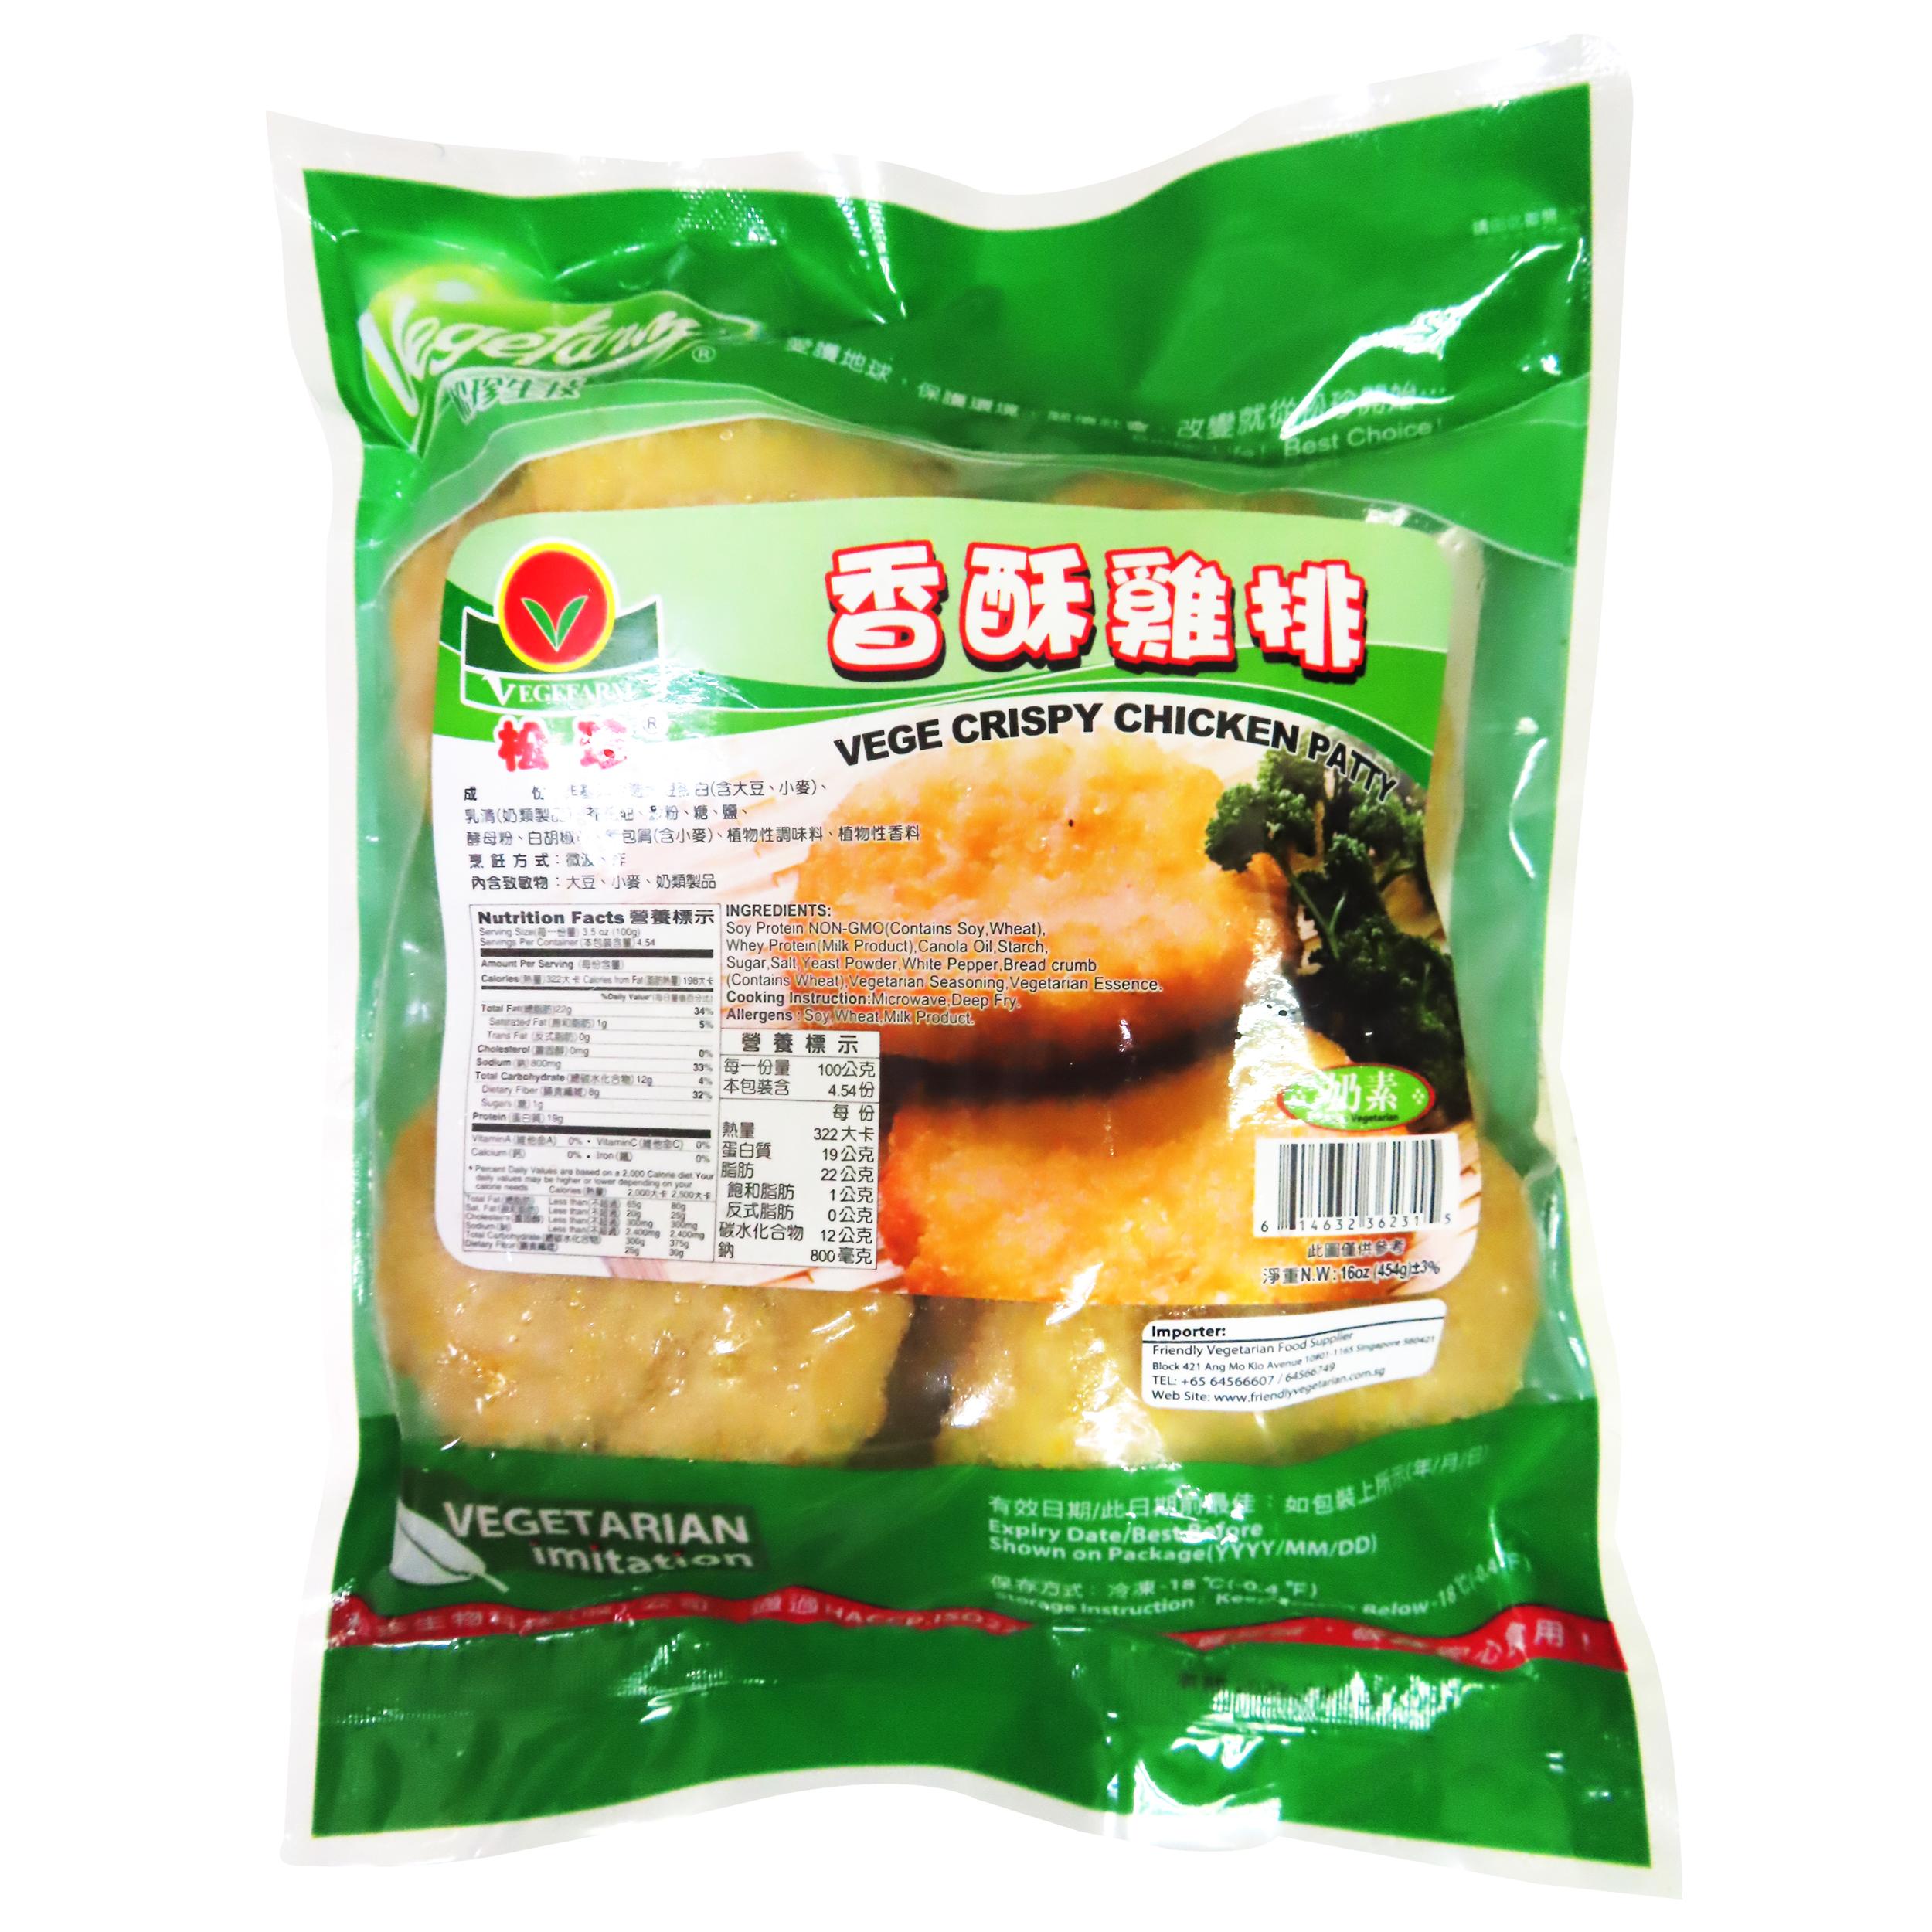 Image Vege Crispy Chicken Patty 松珍香酥鸡排 454grams